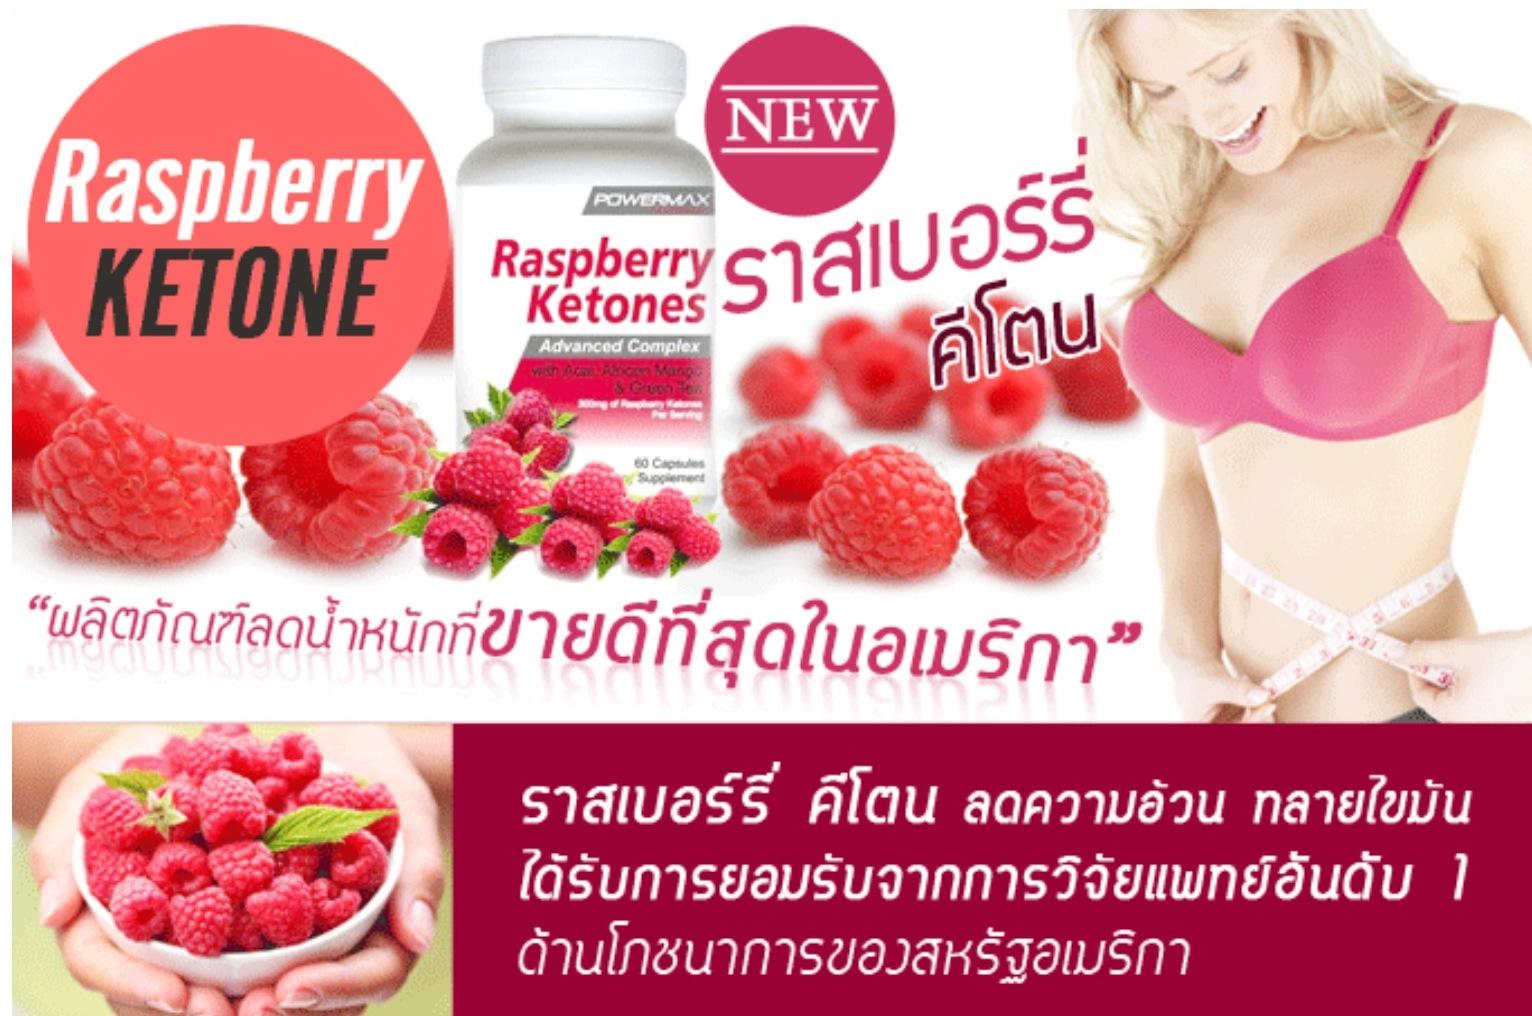 Powermax Raspberry Ketones